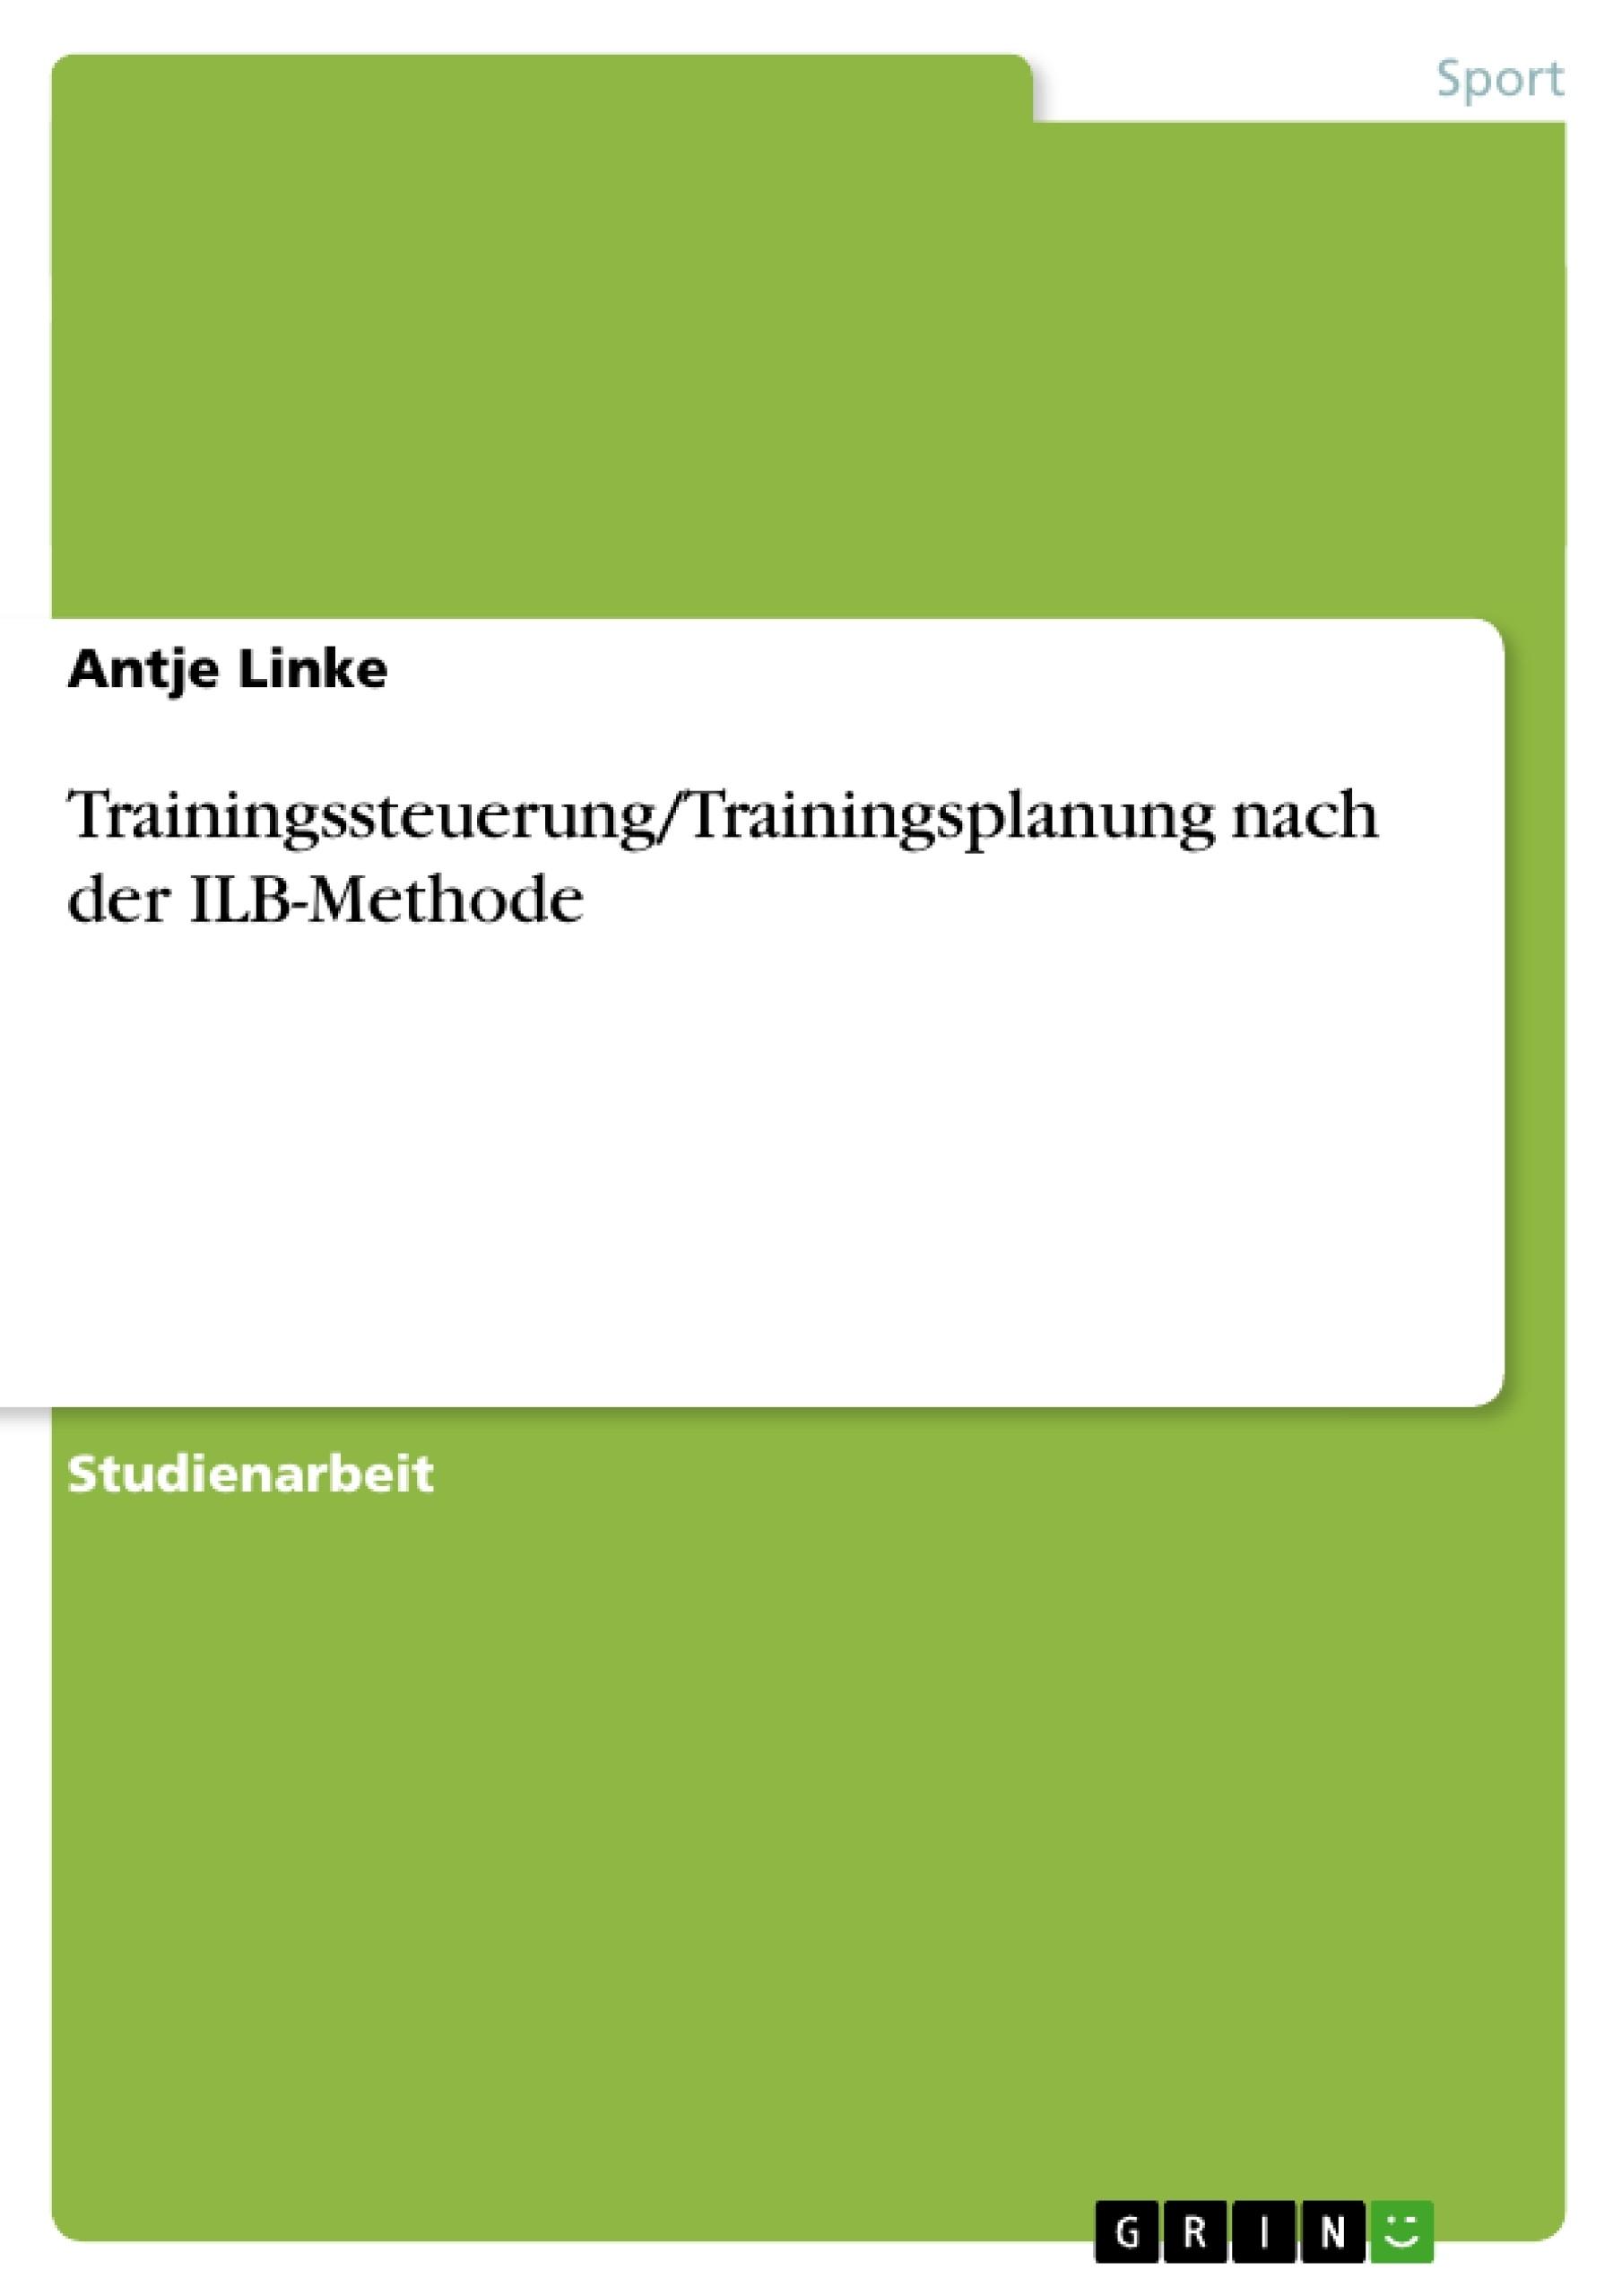 Titel: Trainingssteuerung/Trainingsplanung nach der ILB-Methode